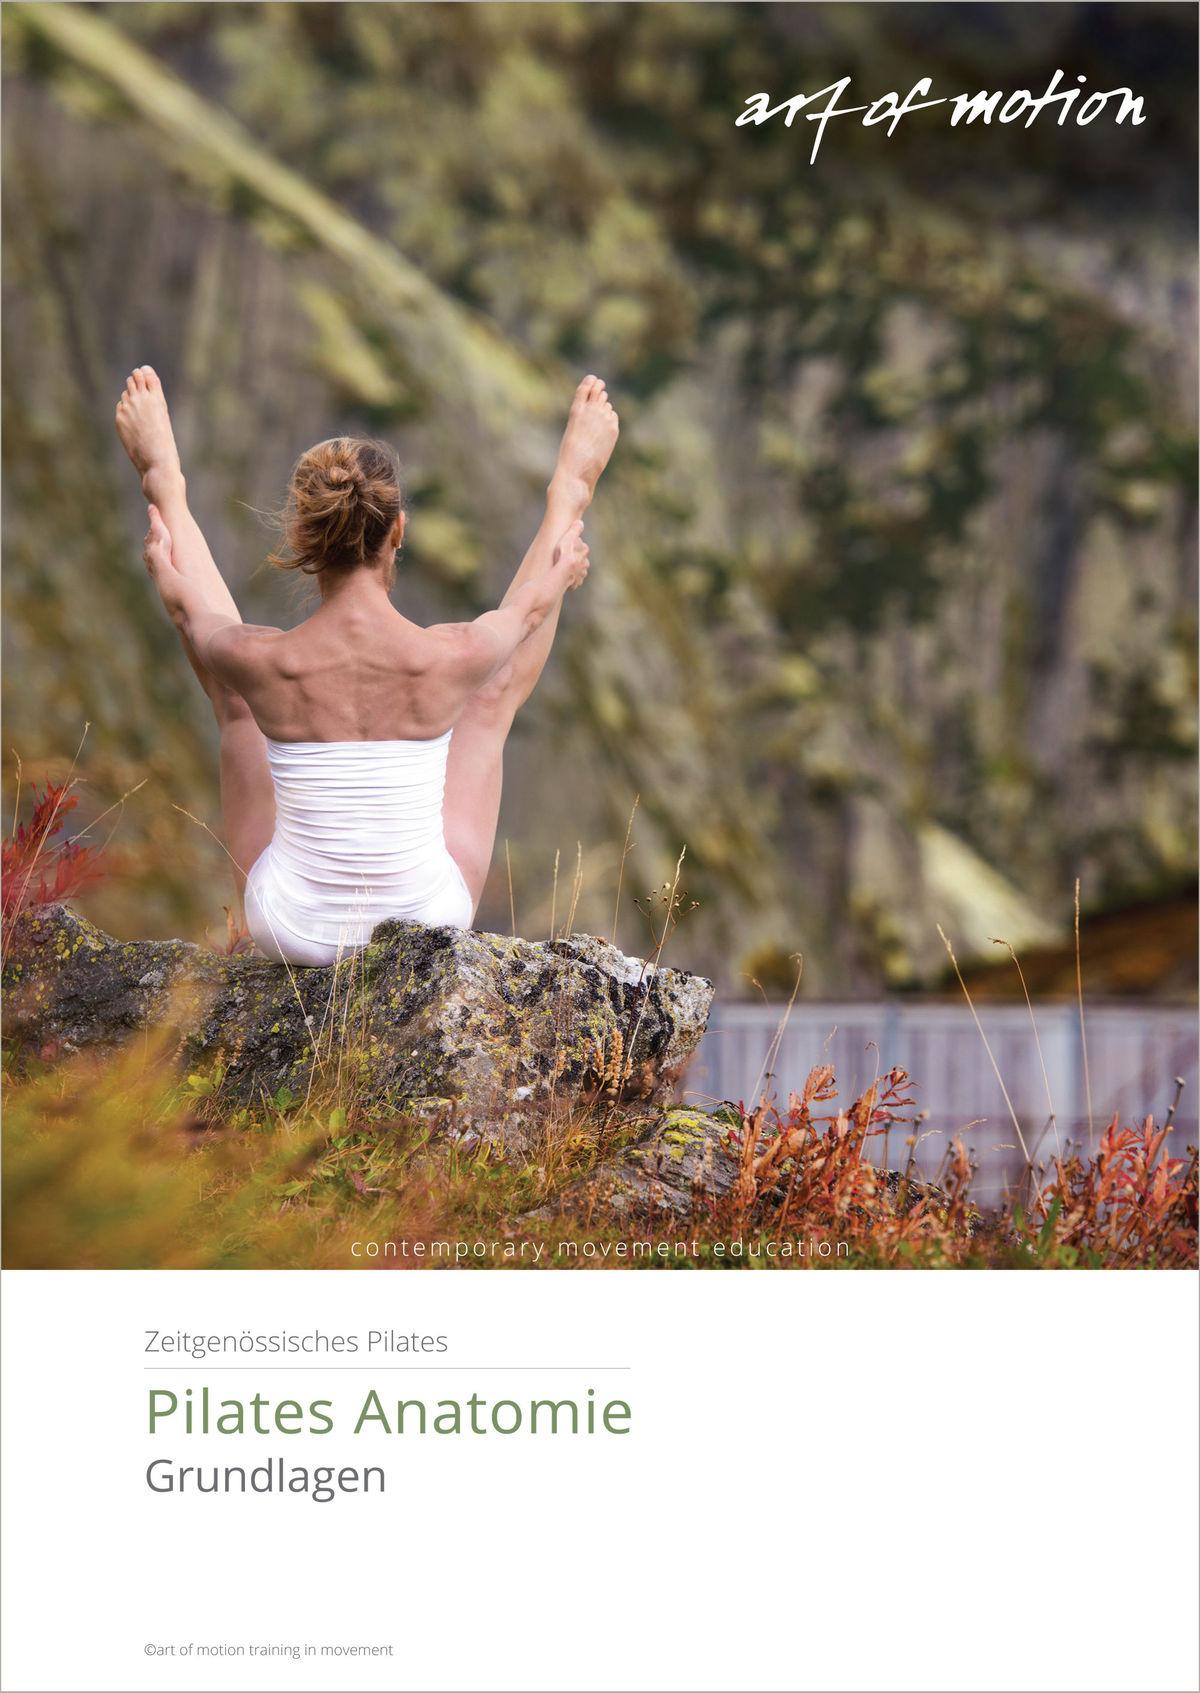 Pilates Anatomie - art of motion